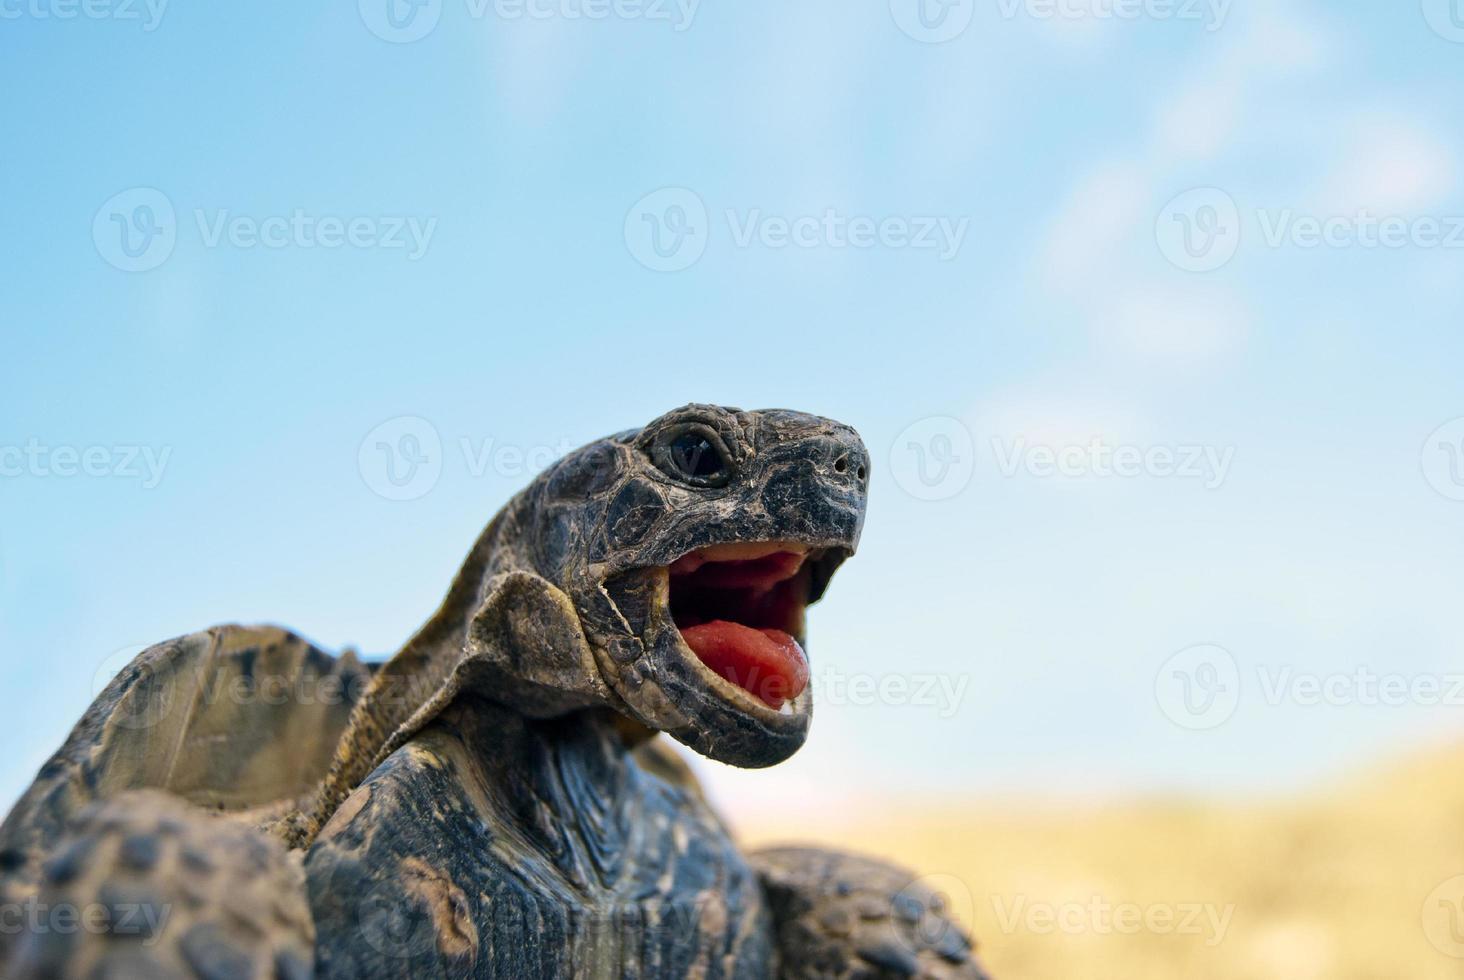 tortuga gritando foto